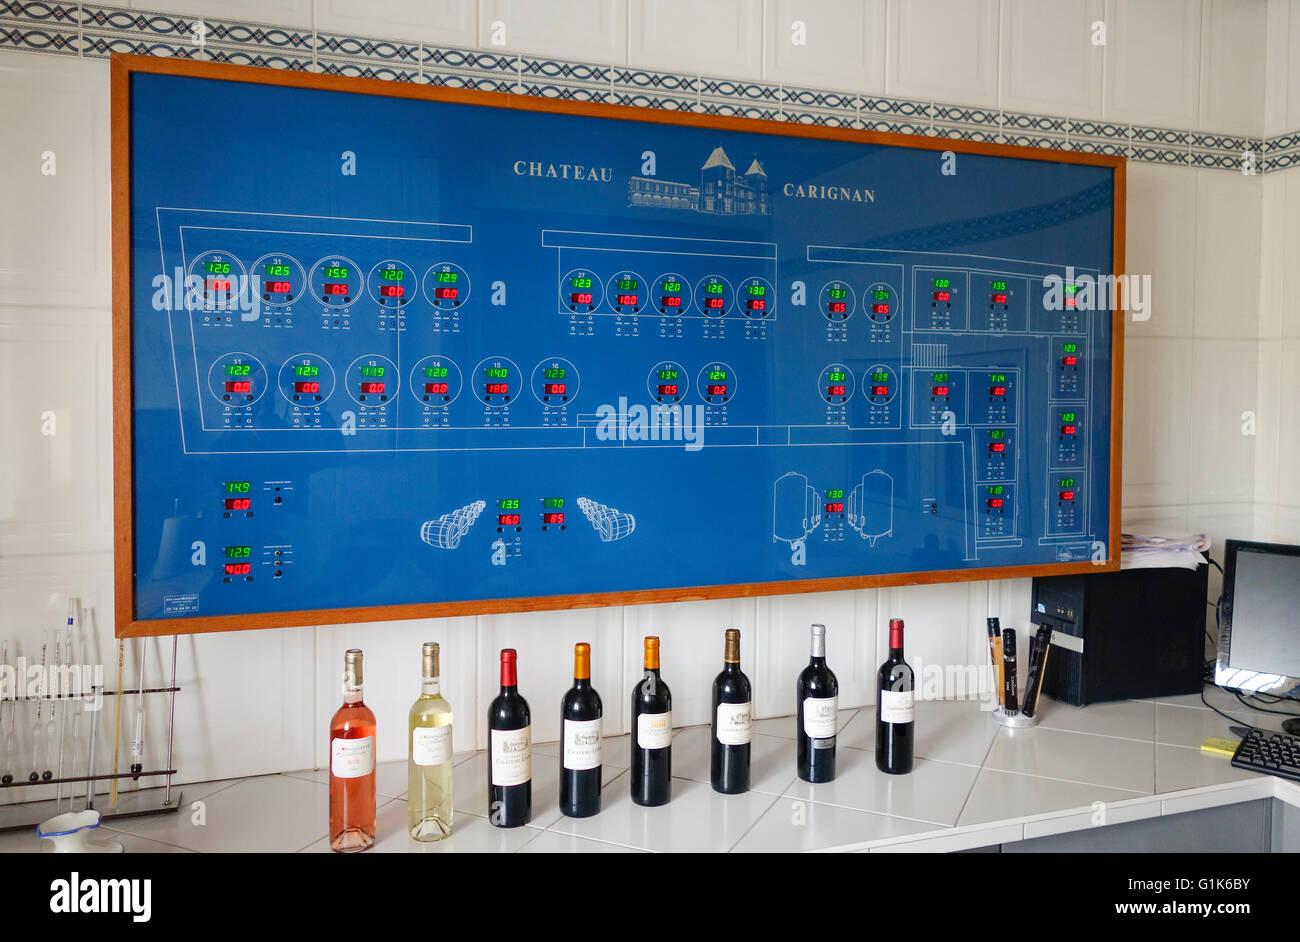 Temperature control panel of wine barrels and fermentation tanks, Wine Estate Chateau Carignan, Carignan de Bordeaux, - Stock Image